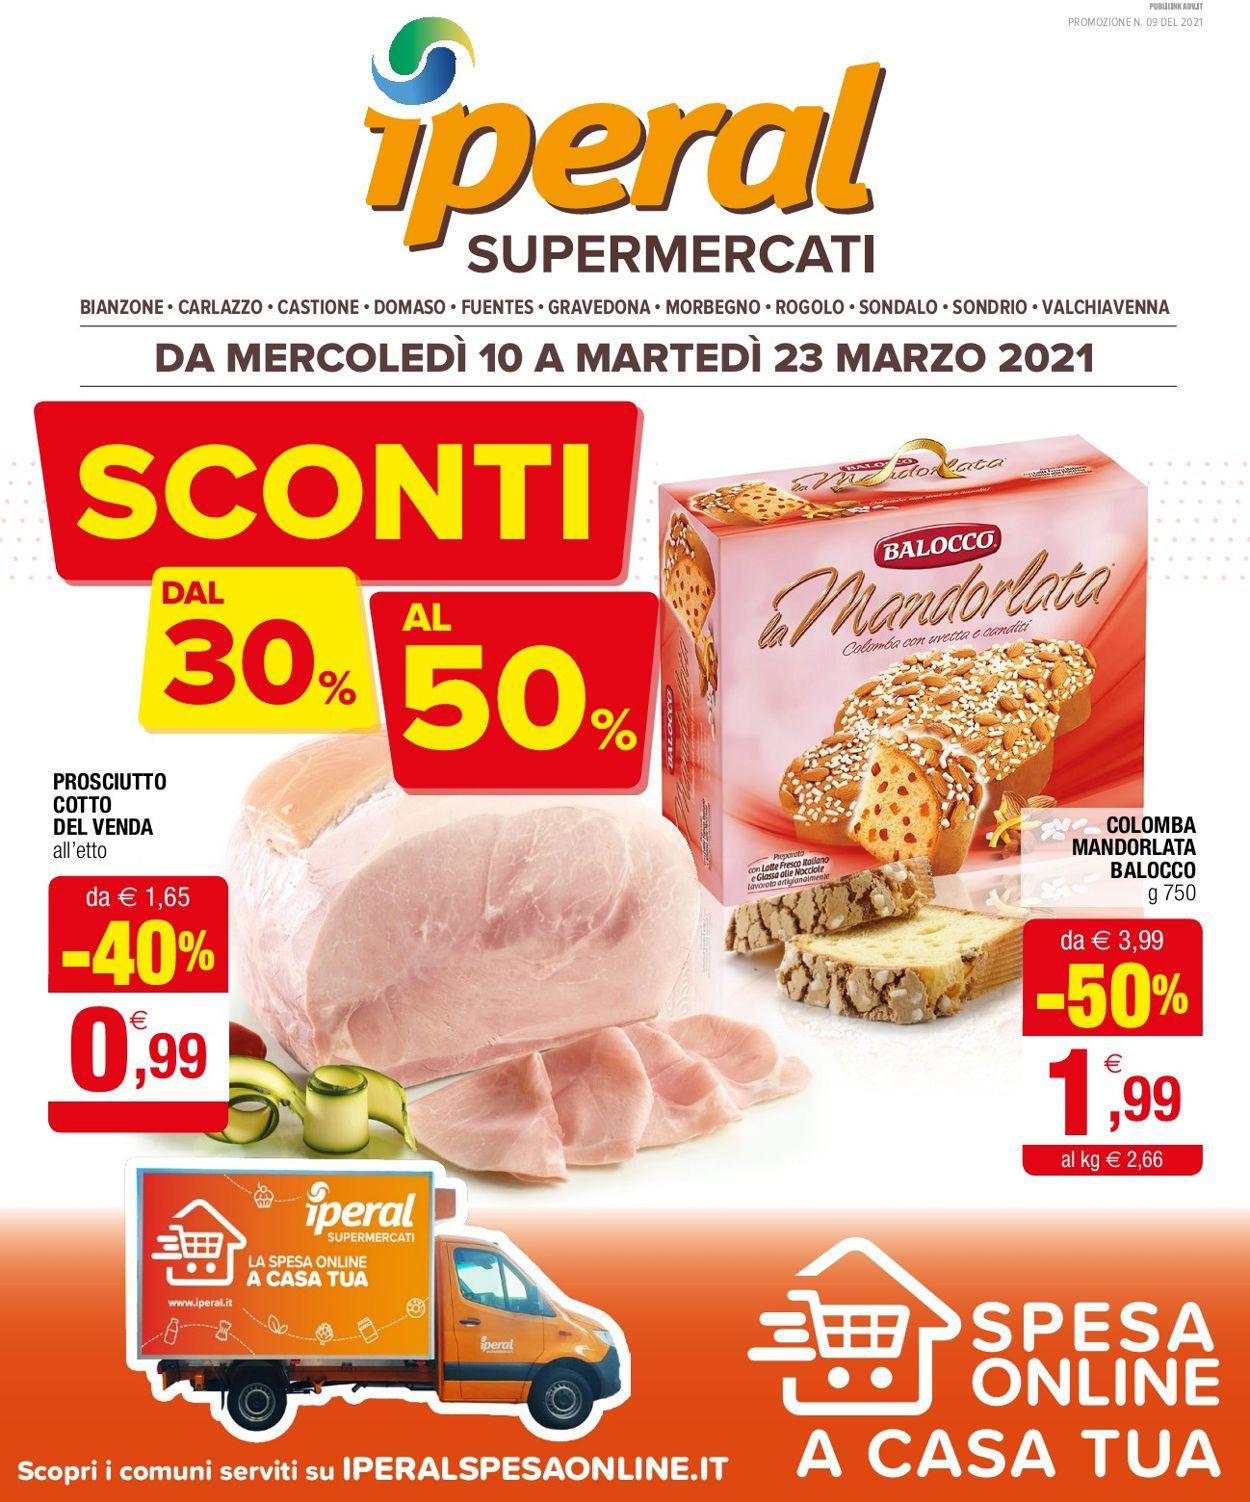 Volantino Iperal - Offerte 10/03-23/03/2021